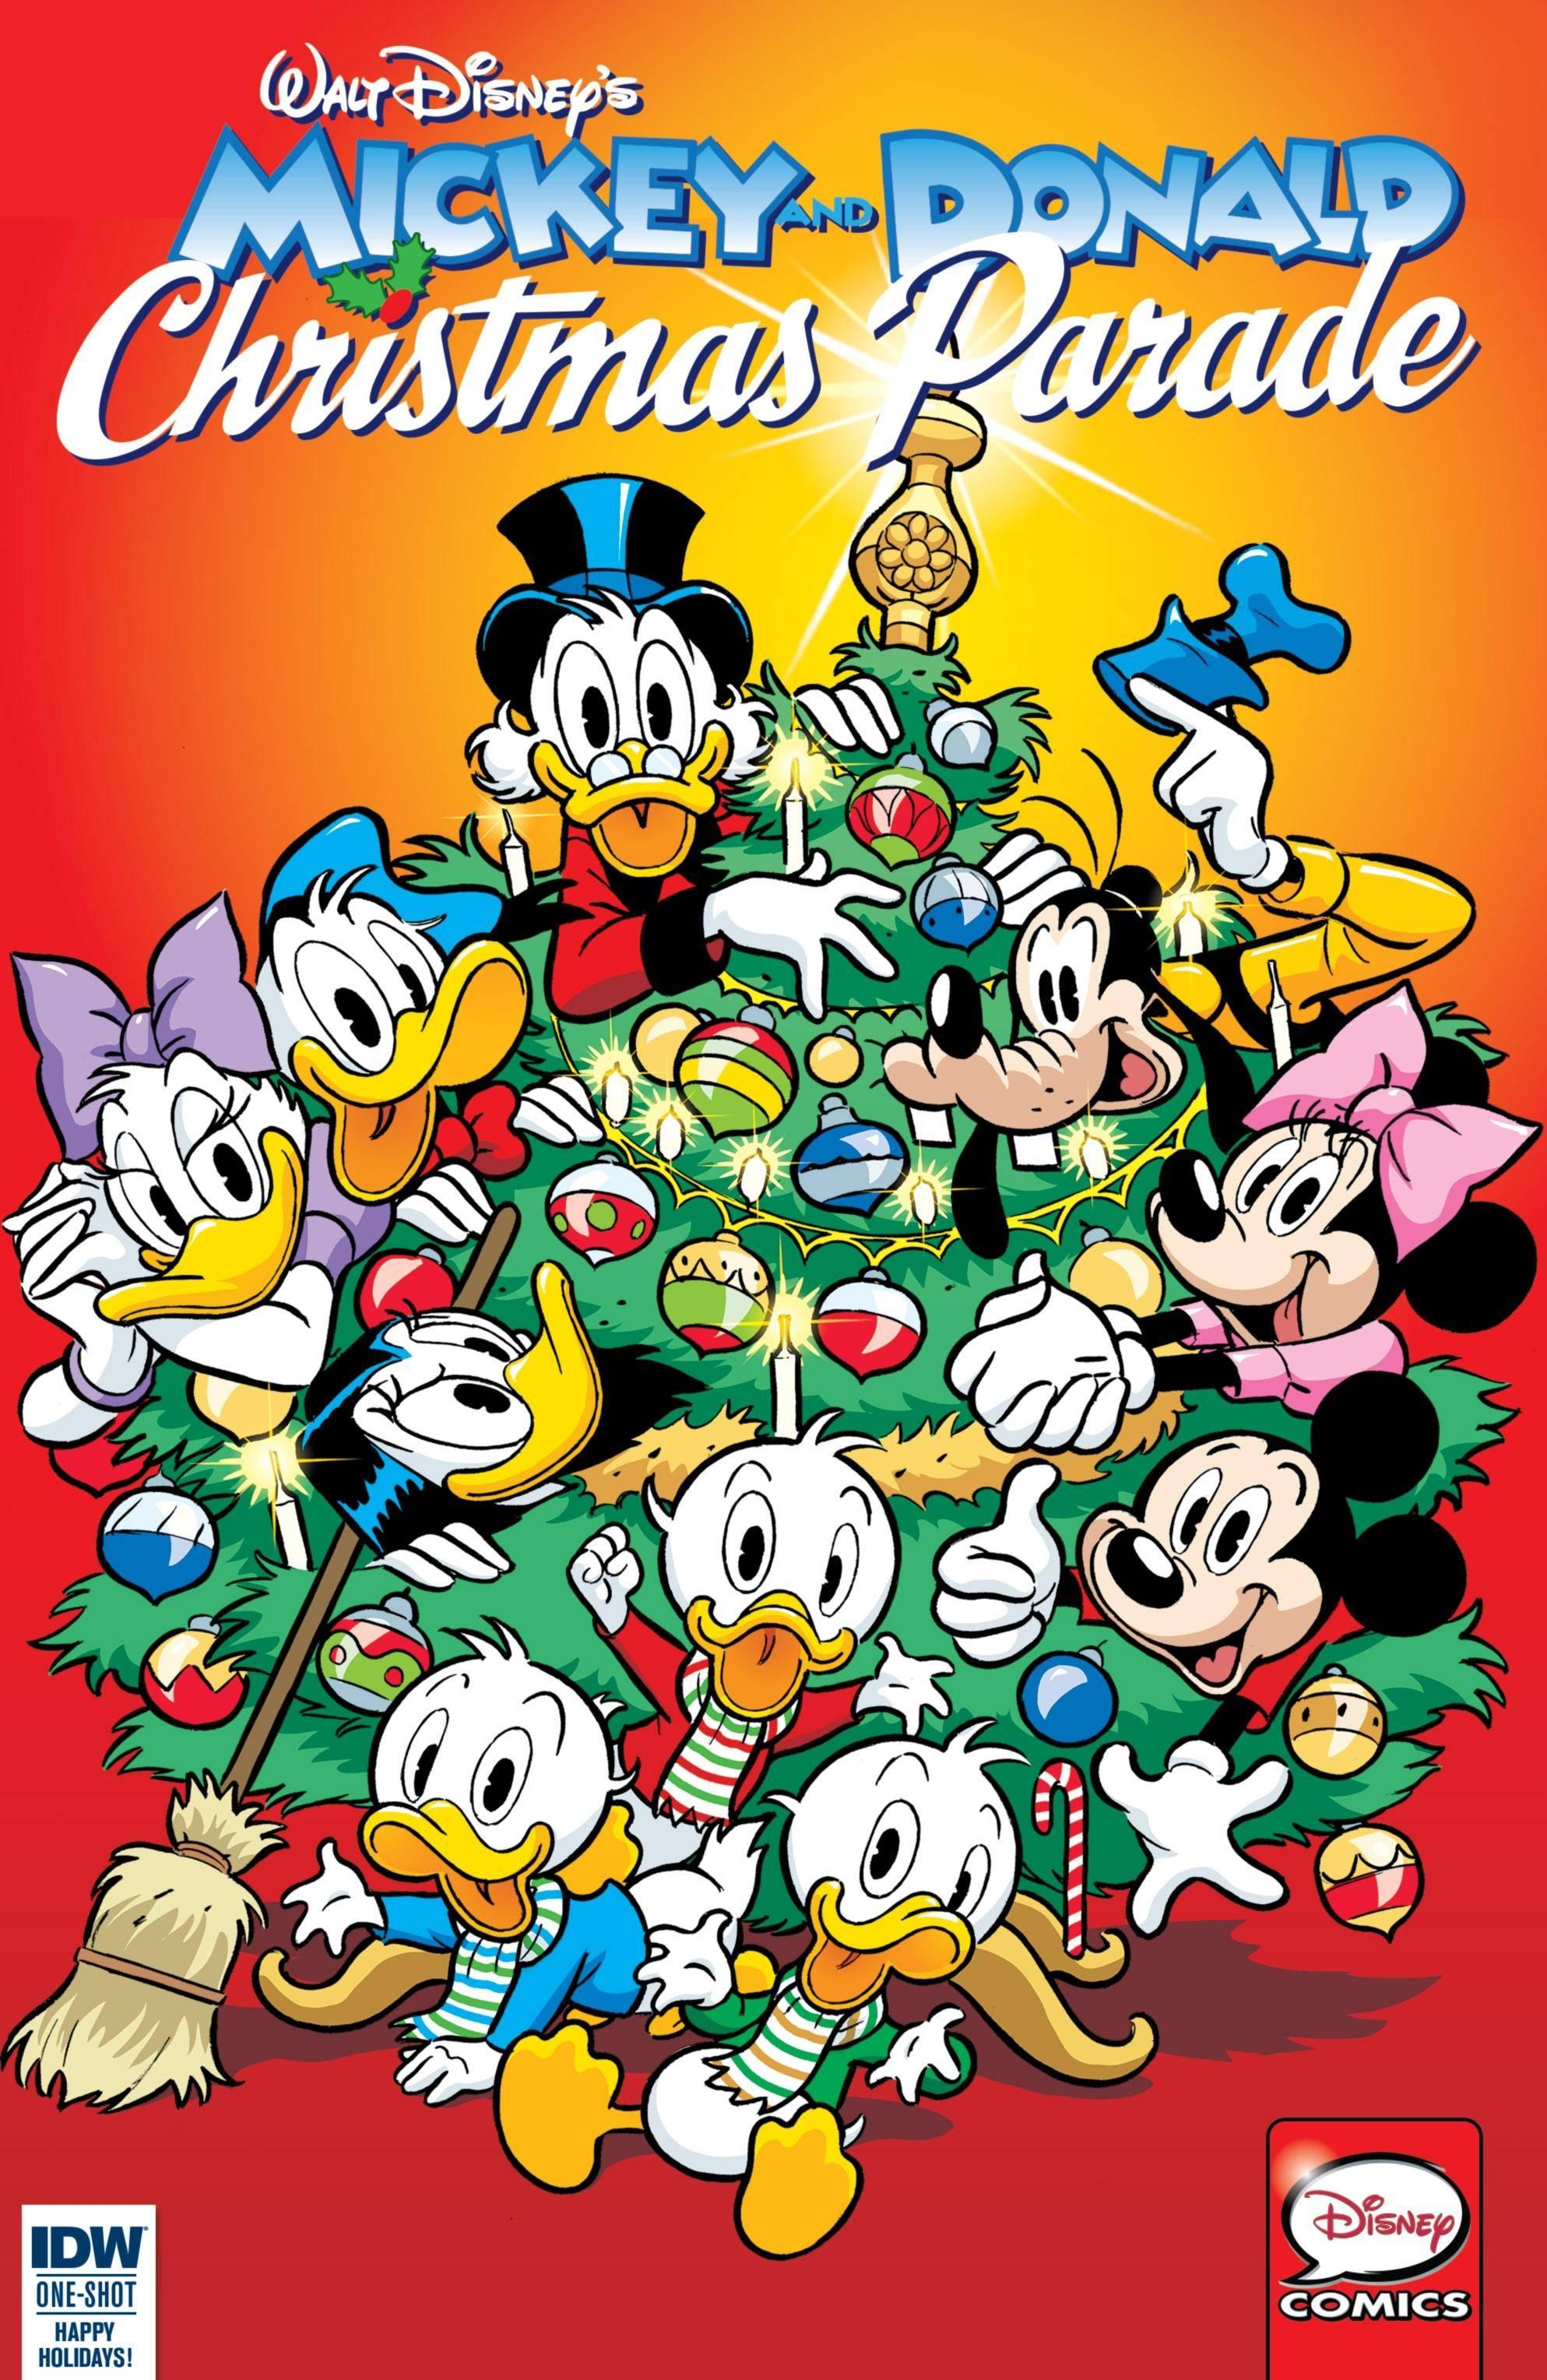 0 Day 2017 12 27 Mickey and Donald Christmas Parade 003 2017 digital Salem Empire cbr 182761kB